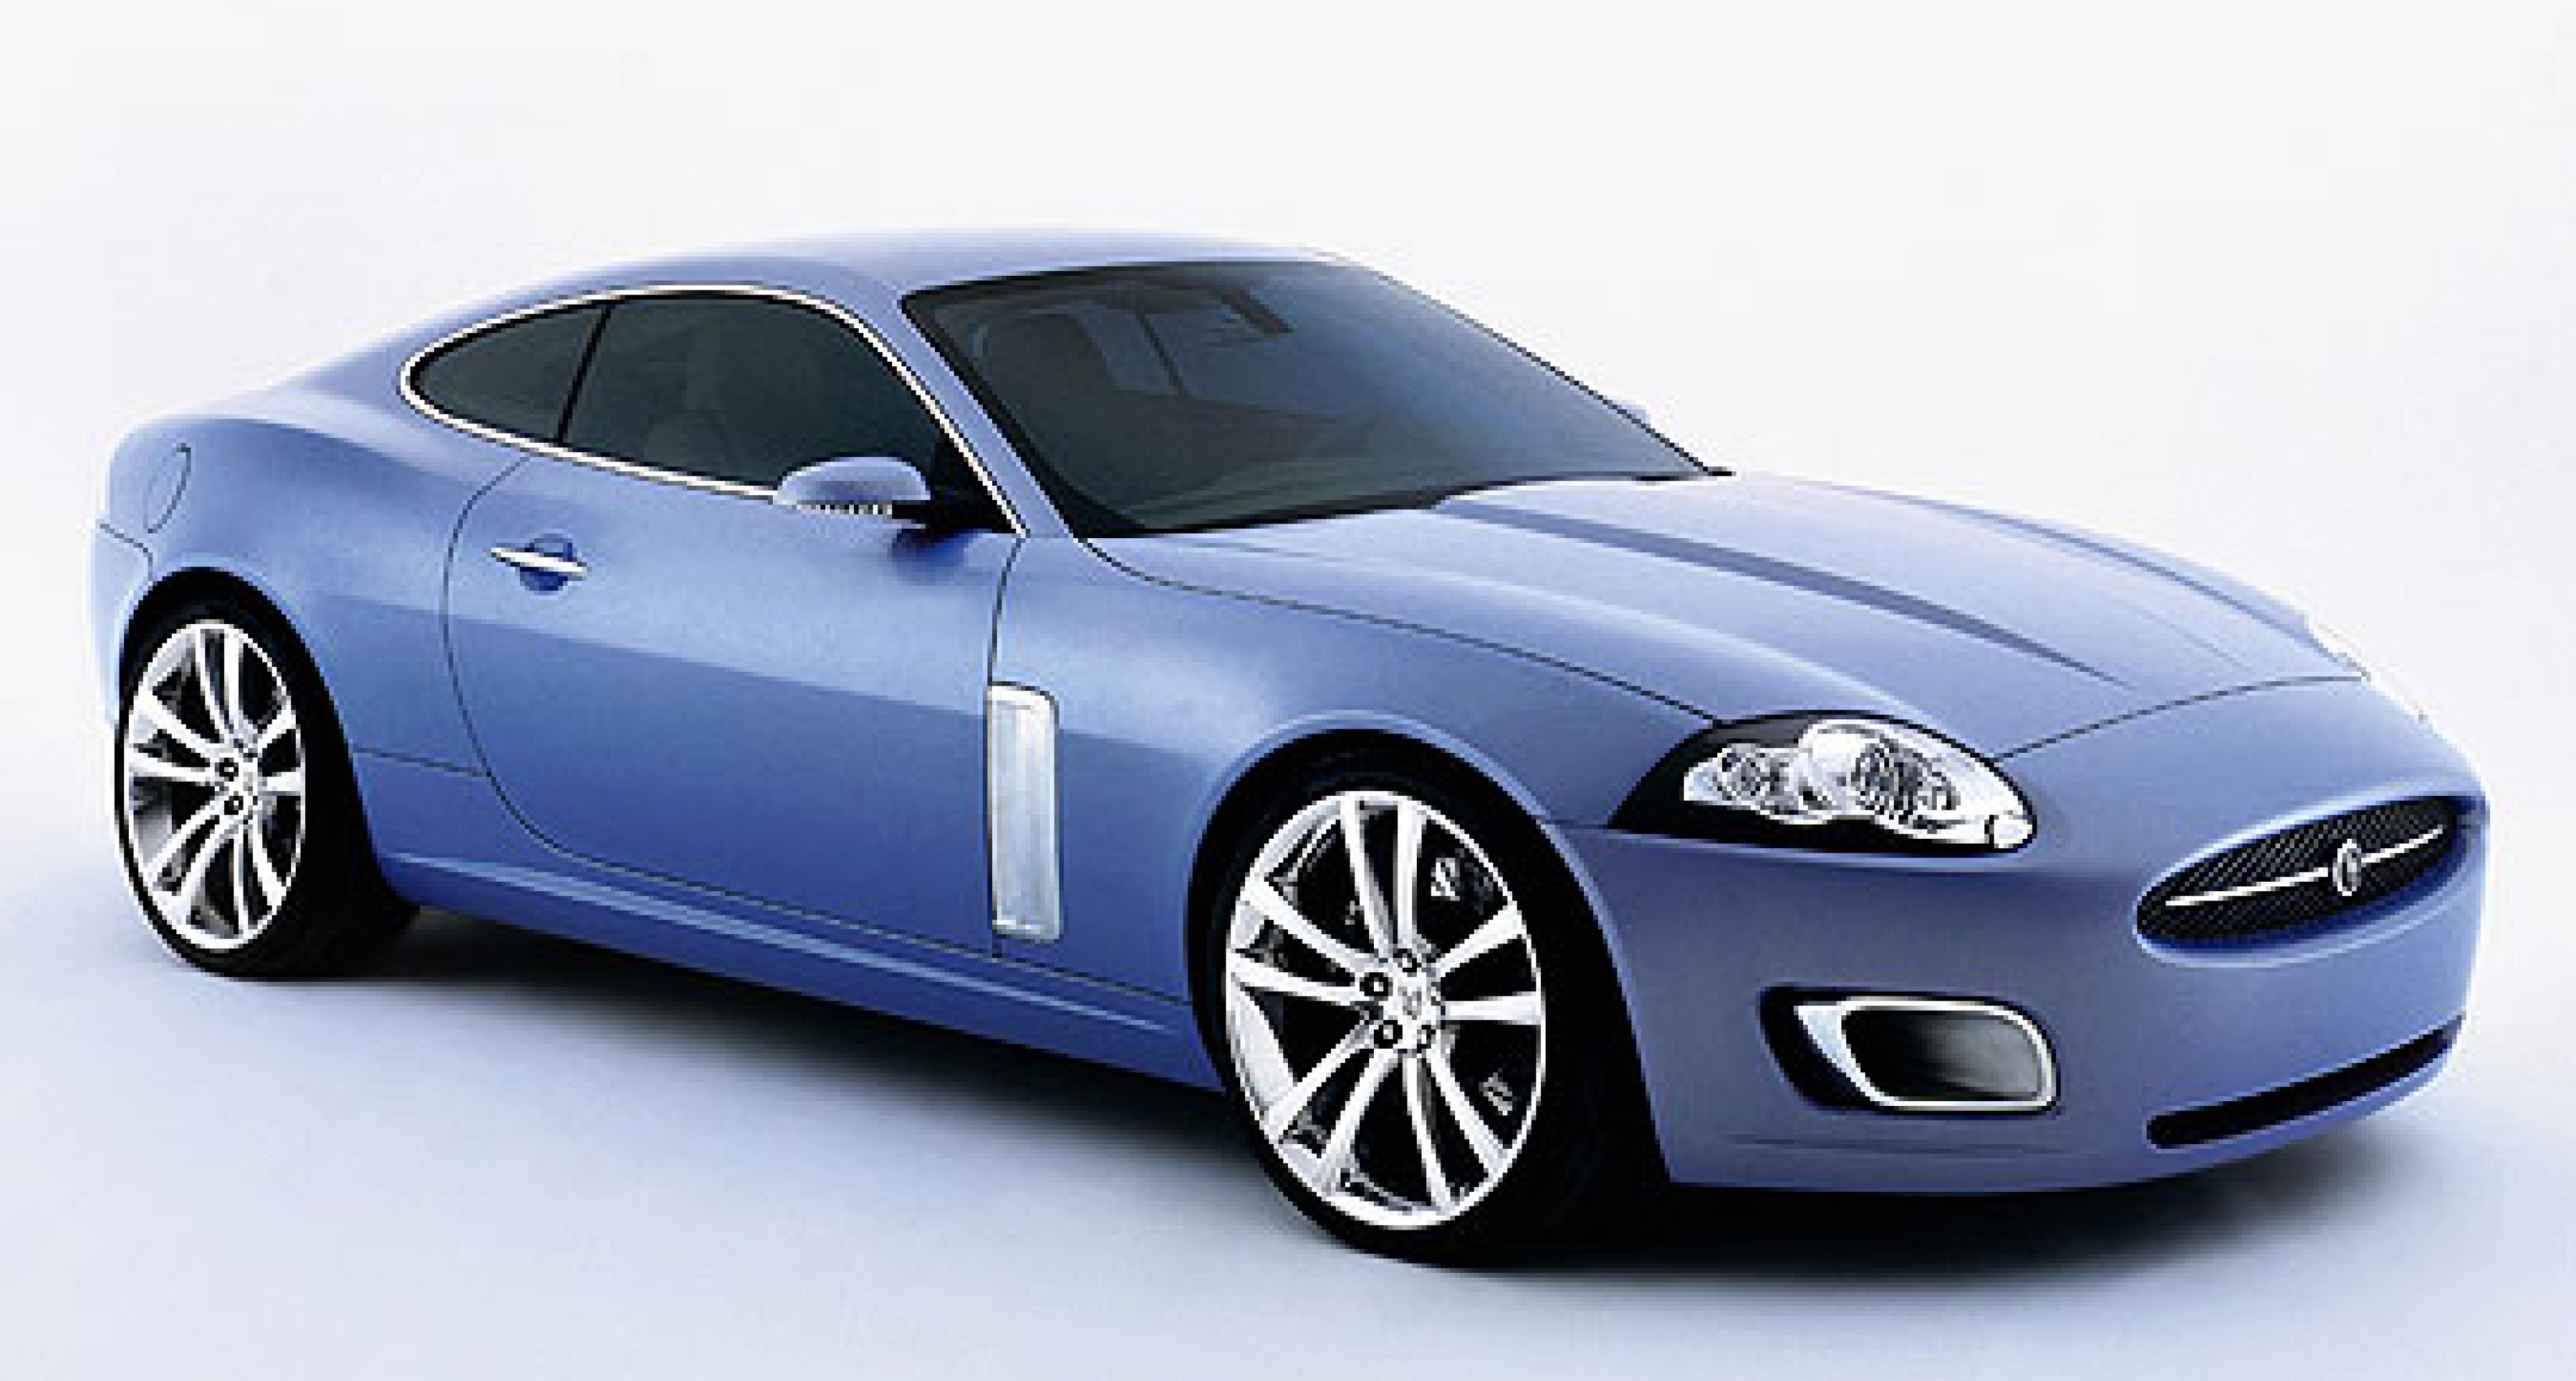 Jaguar Advanced Lightweight Coupé